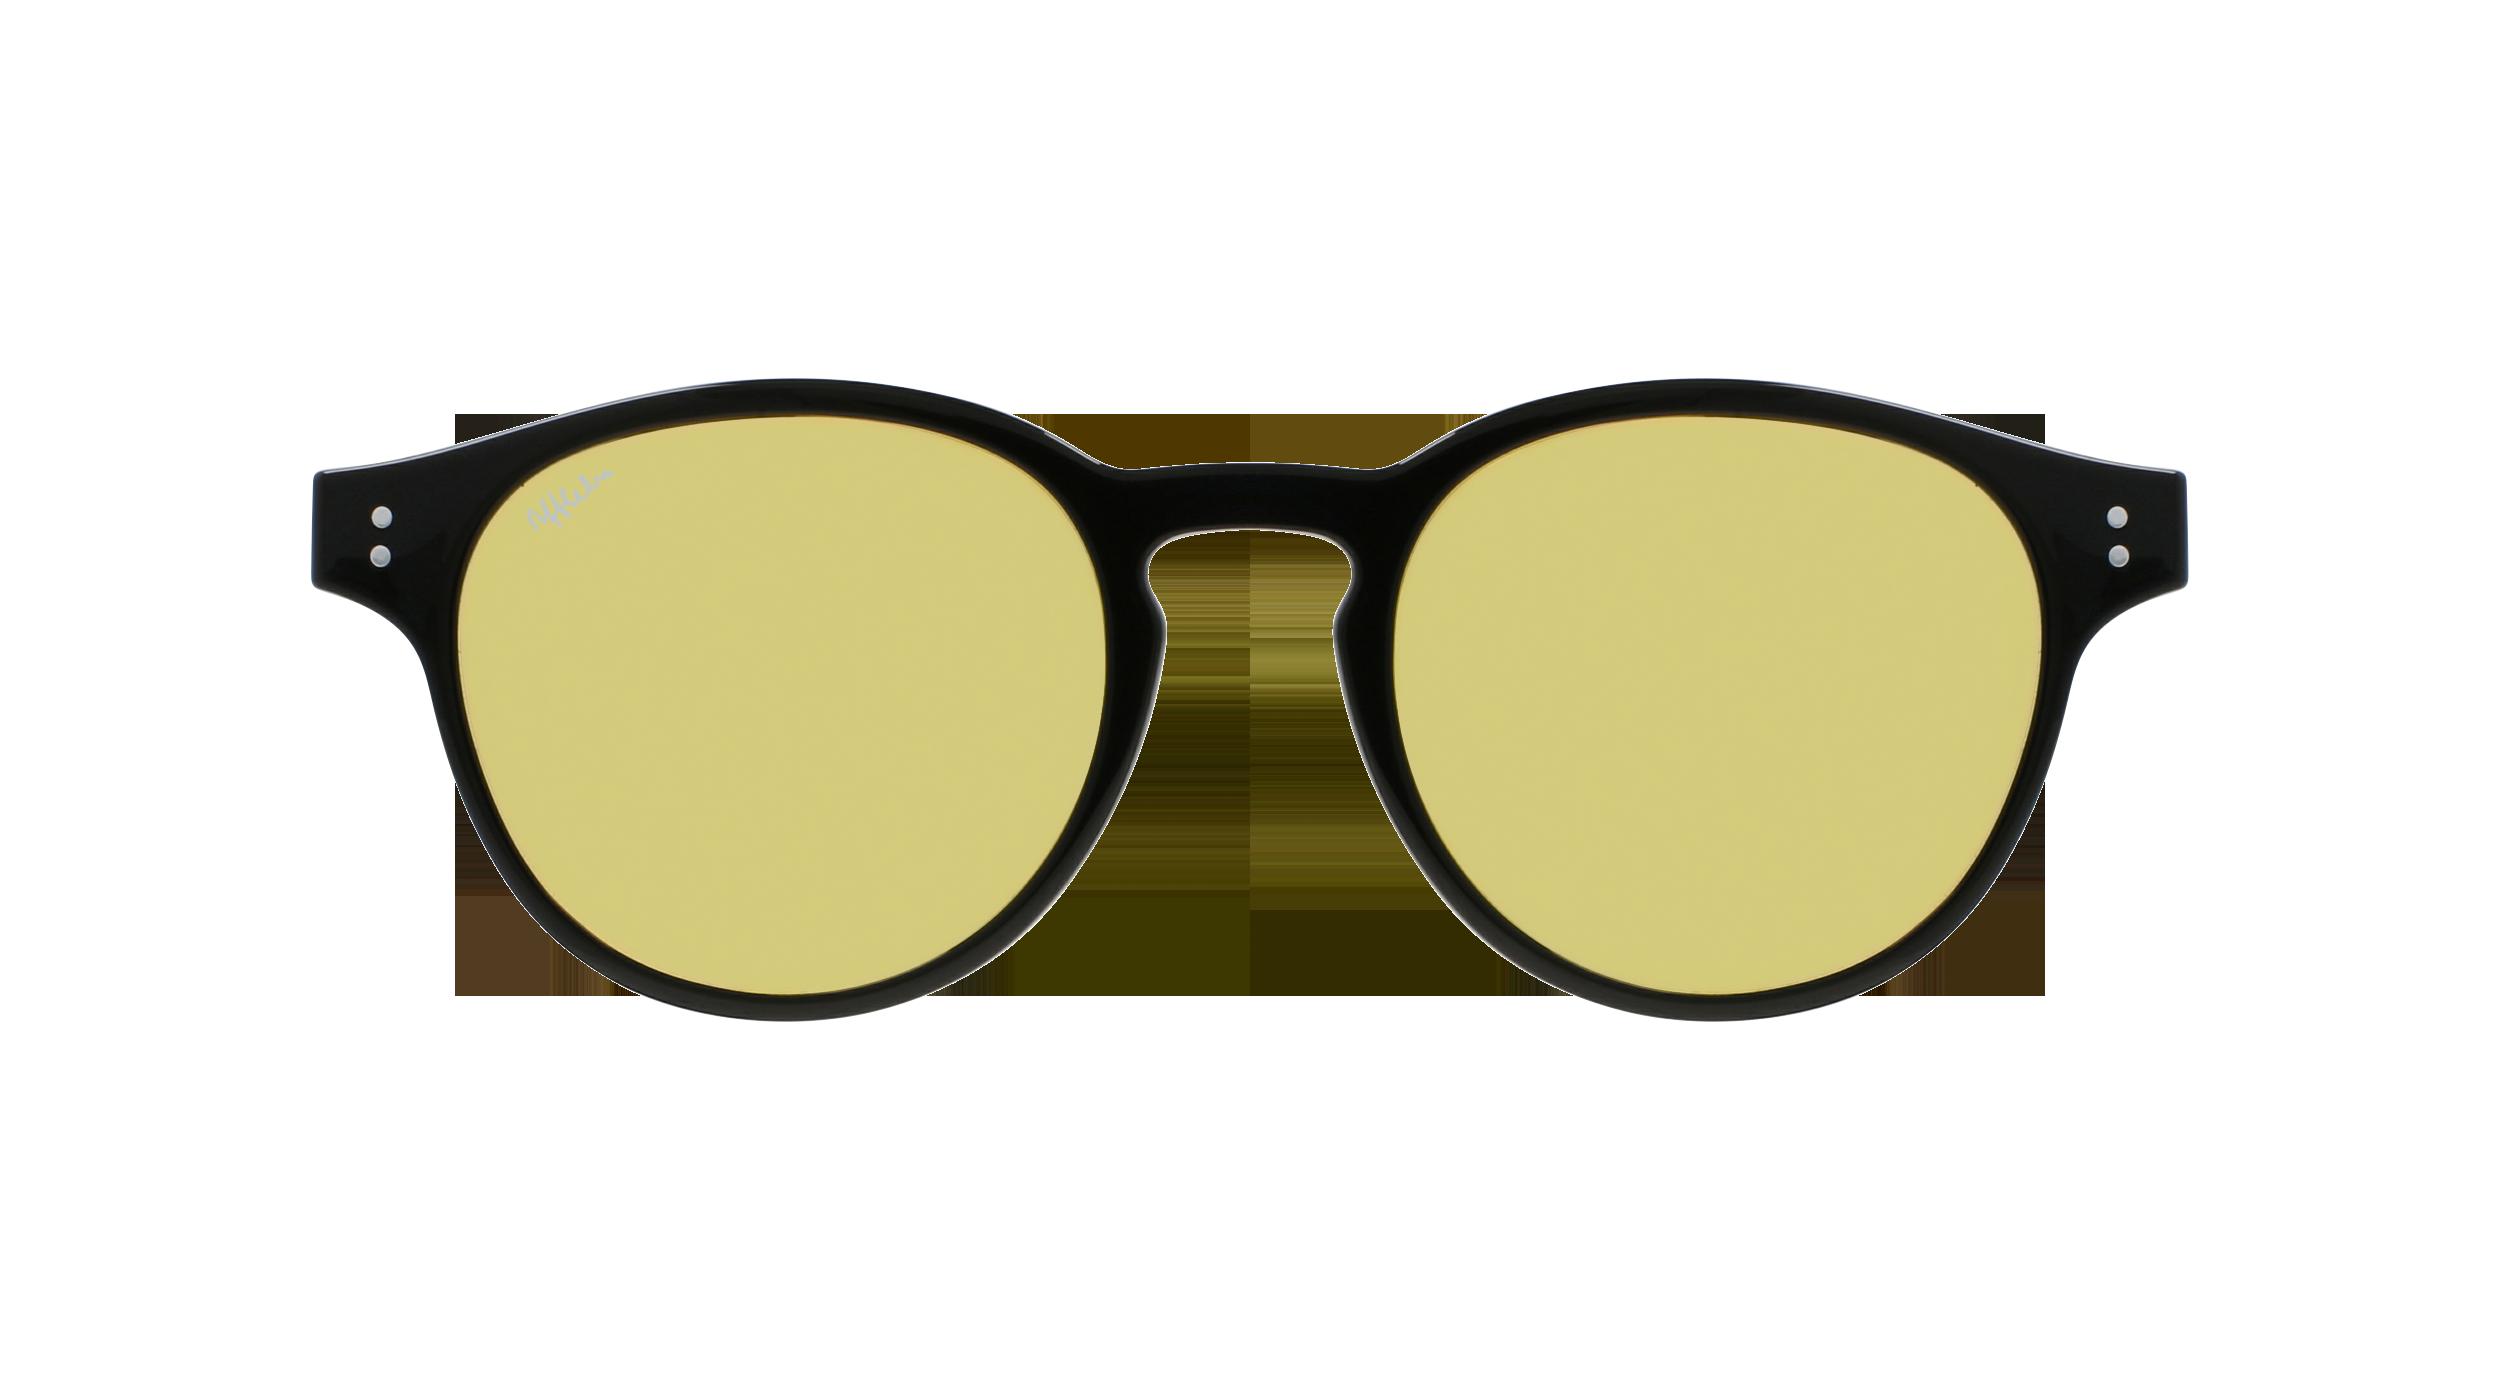 afflelou/france/products/smart_clip/clips_glasses/07630036448298.png